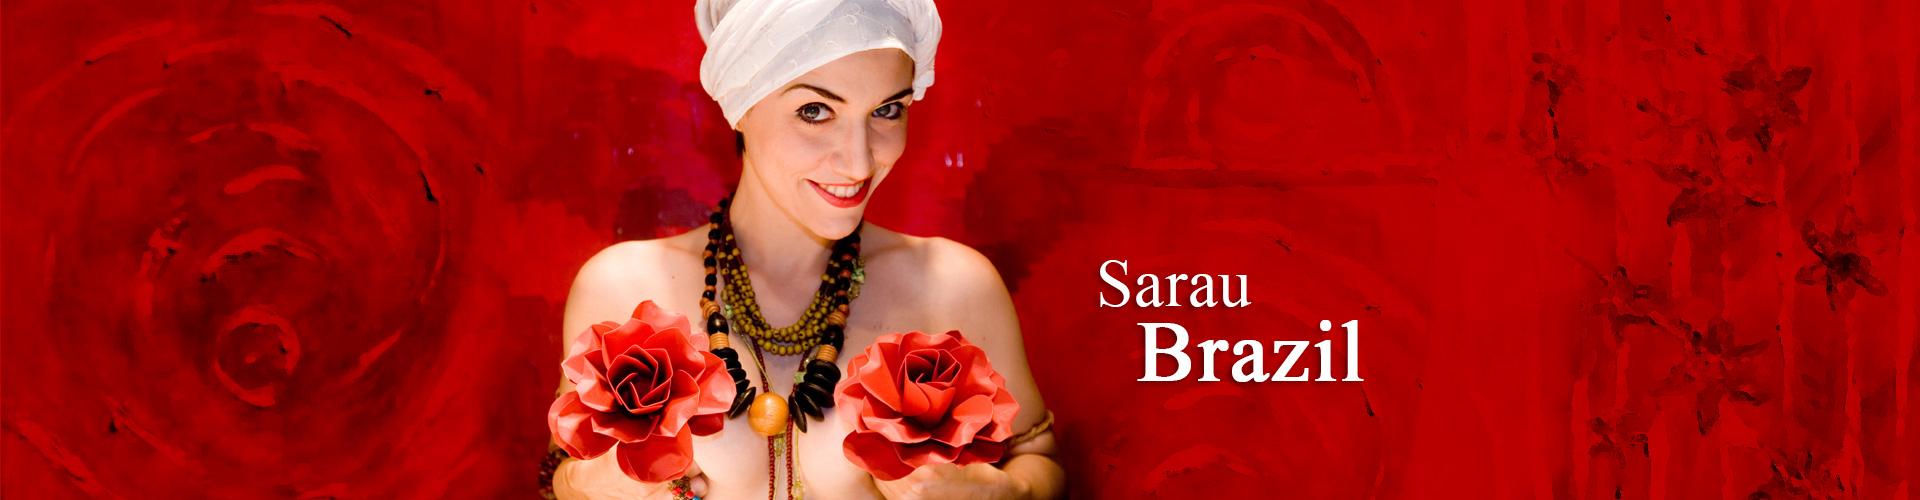 Sarau Brazil